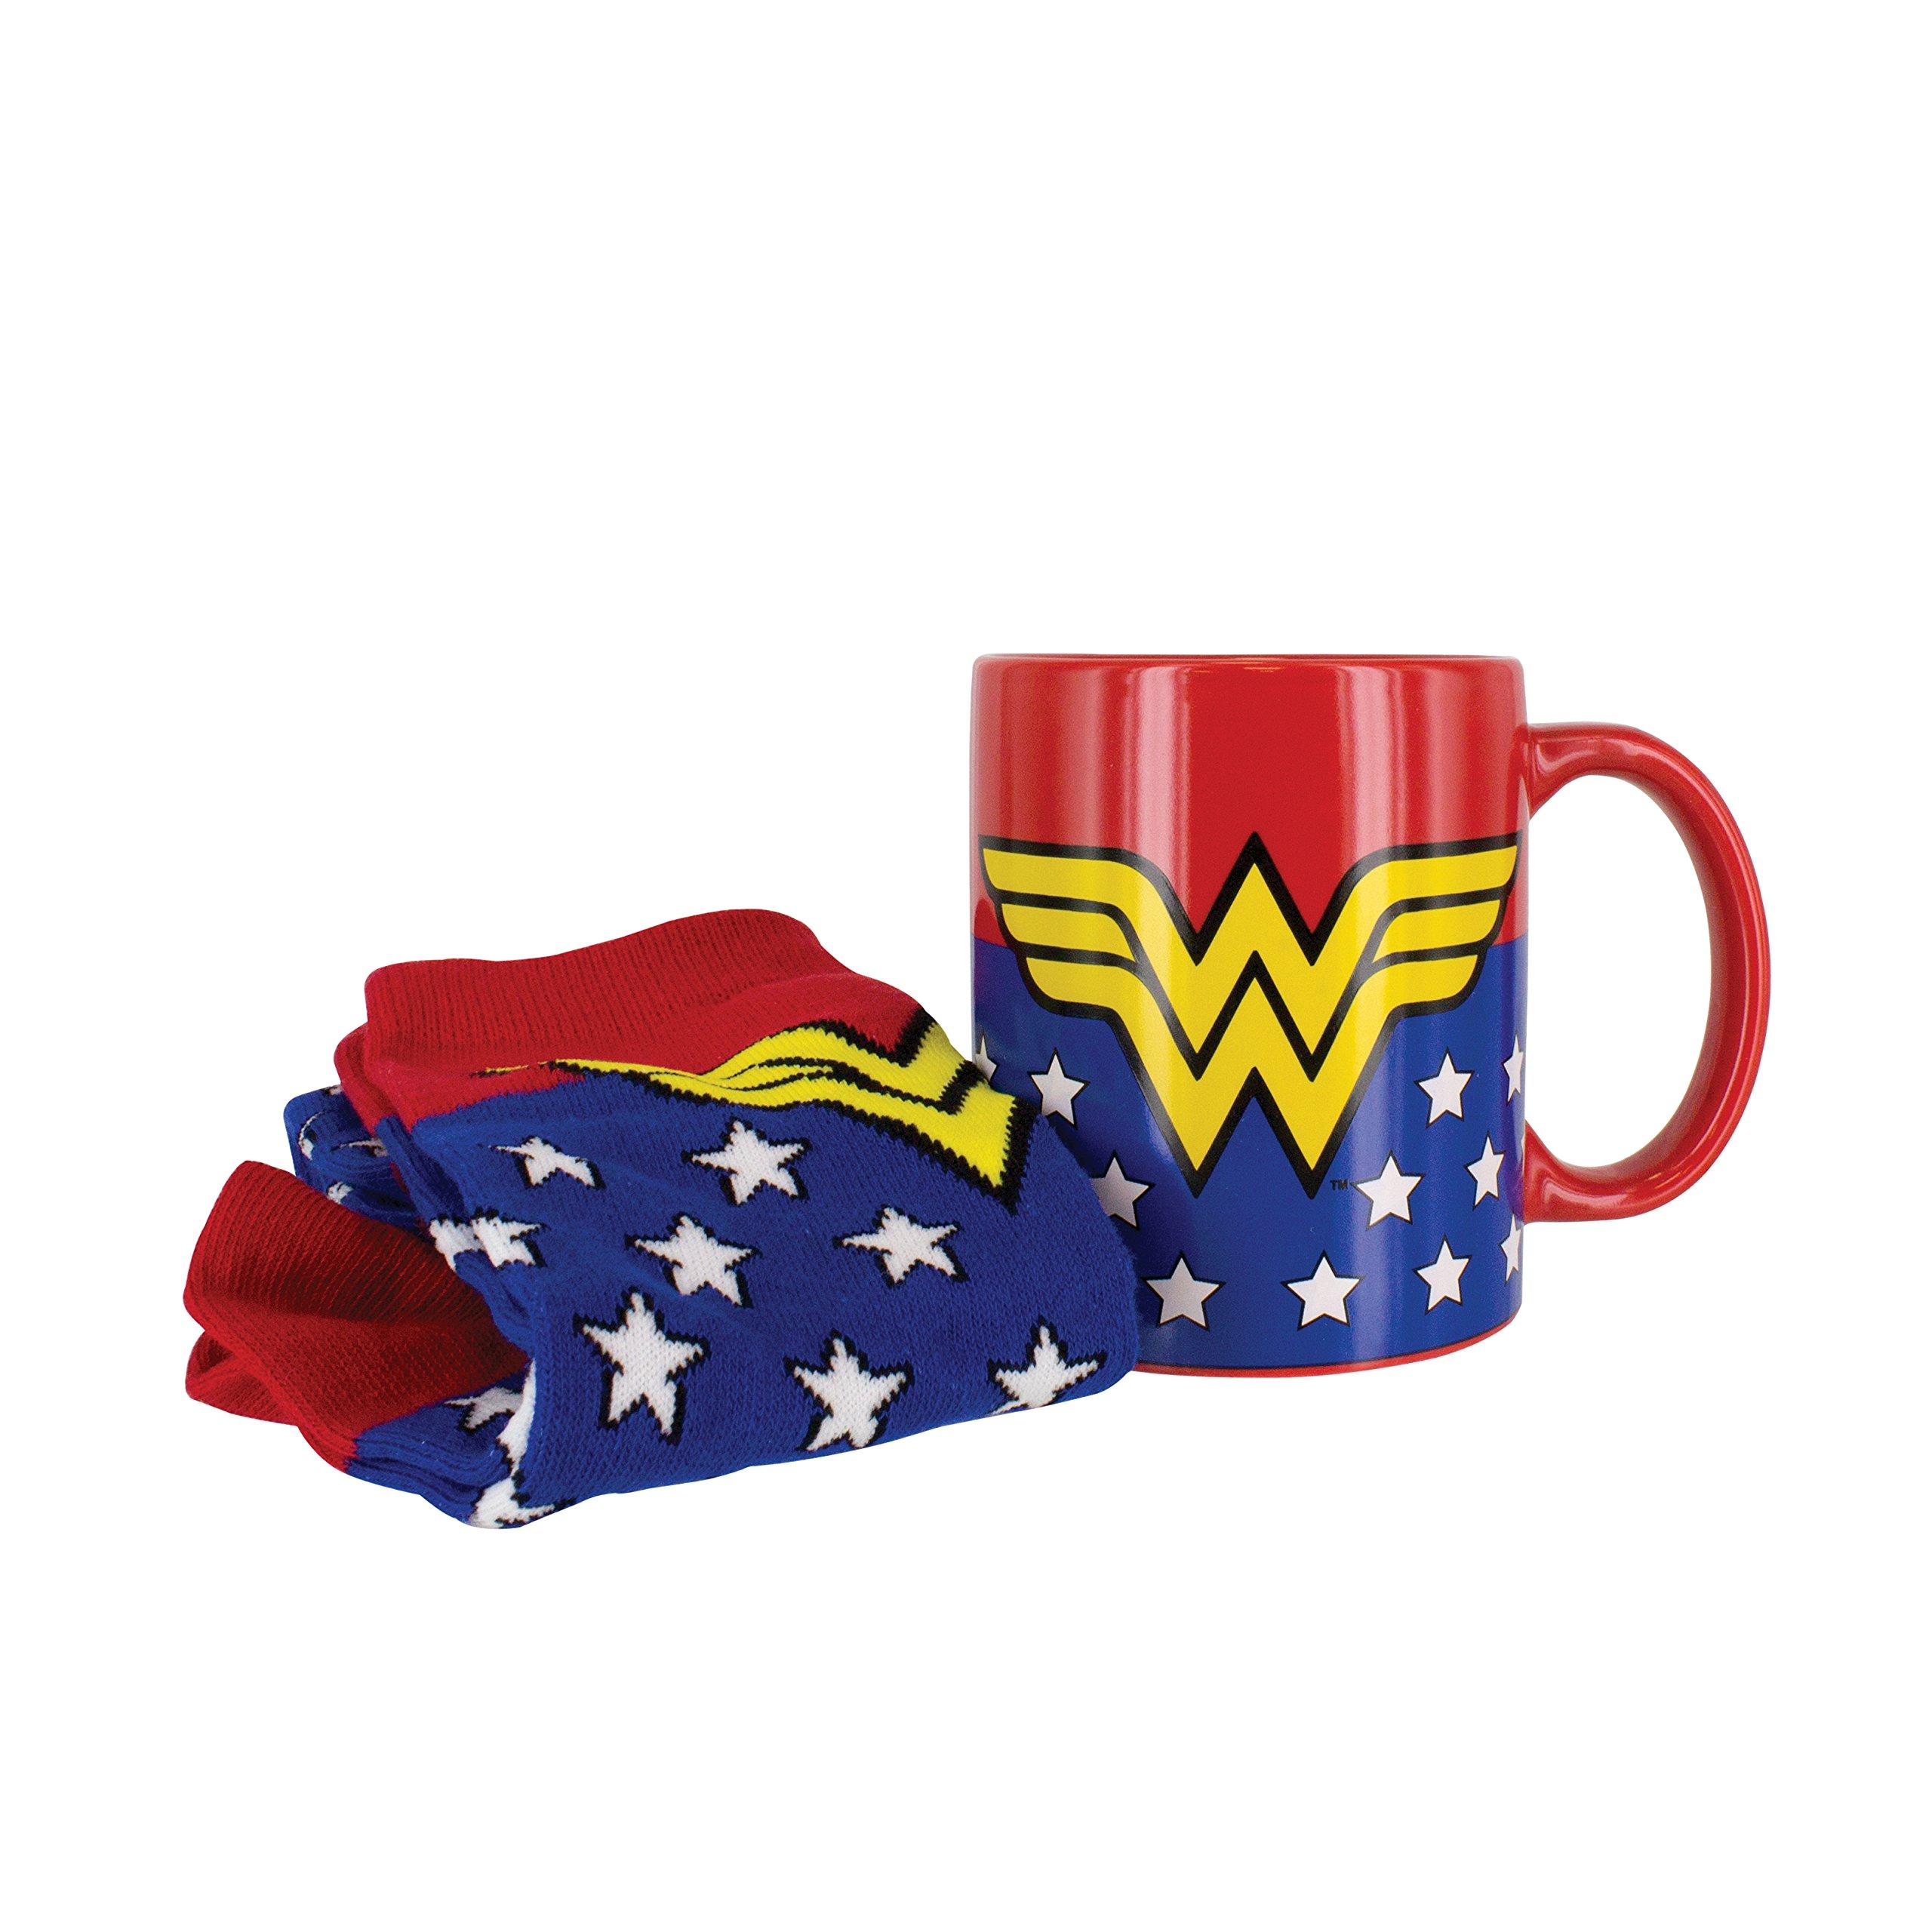 Wonder Woman Mug & Sock Set- Officially Licensed DC Comics Product